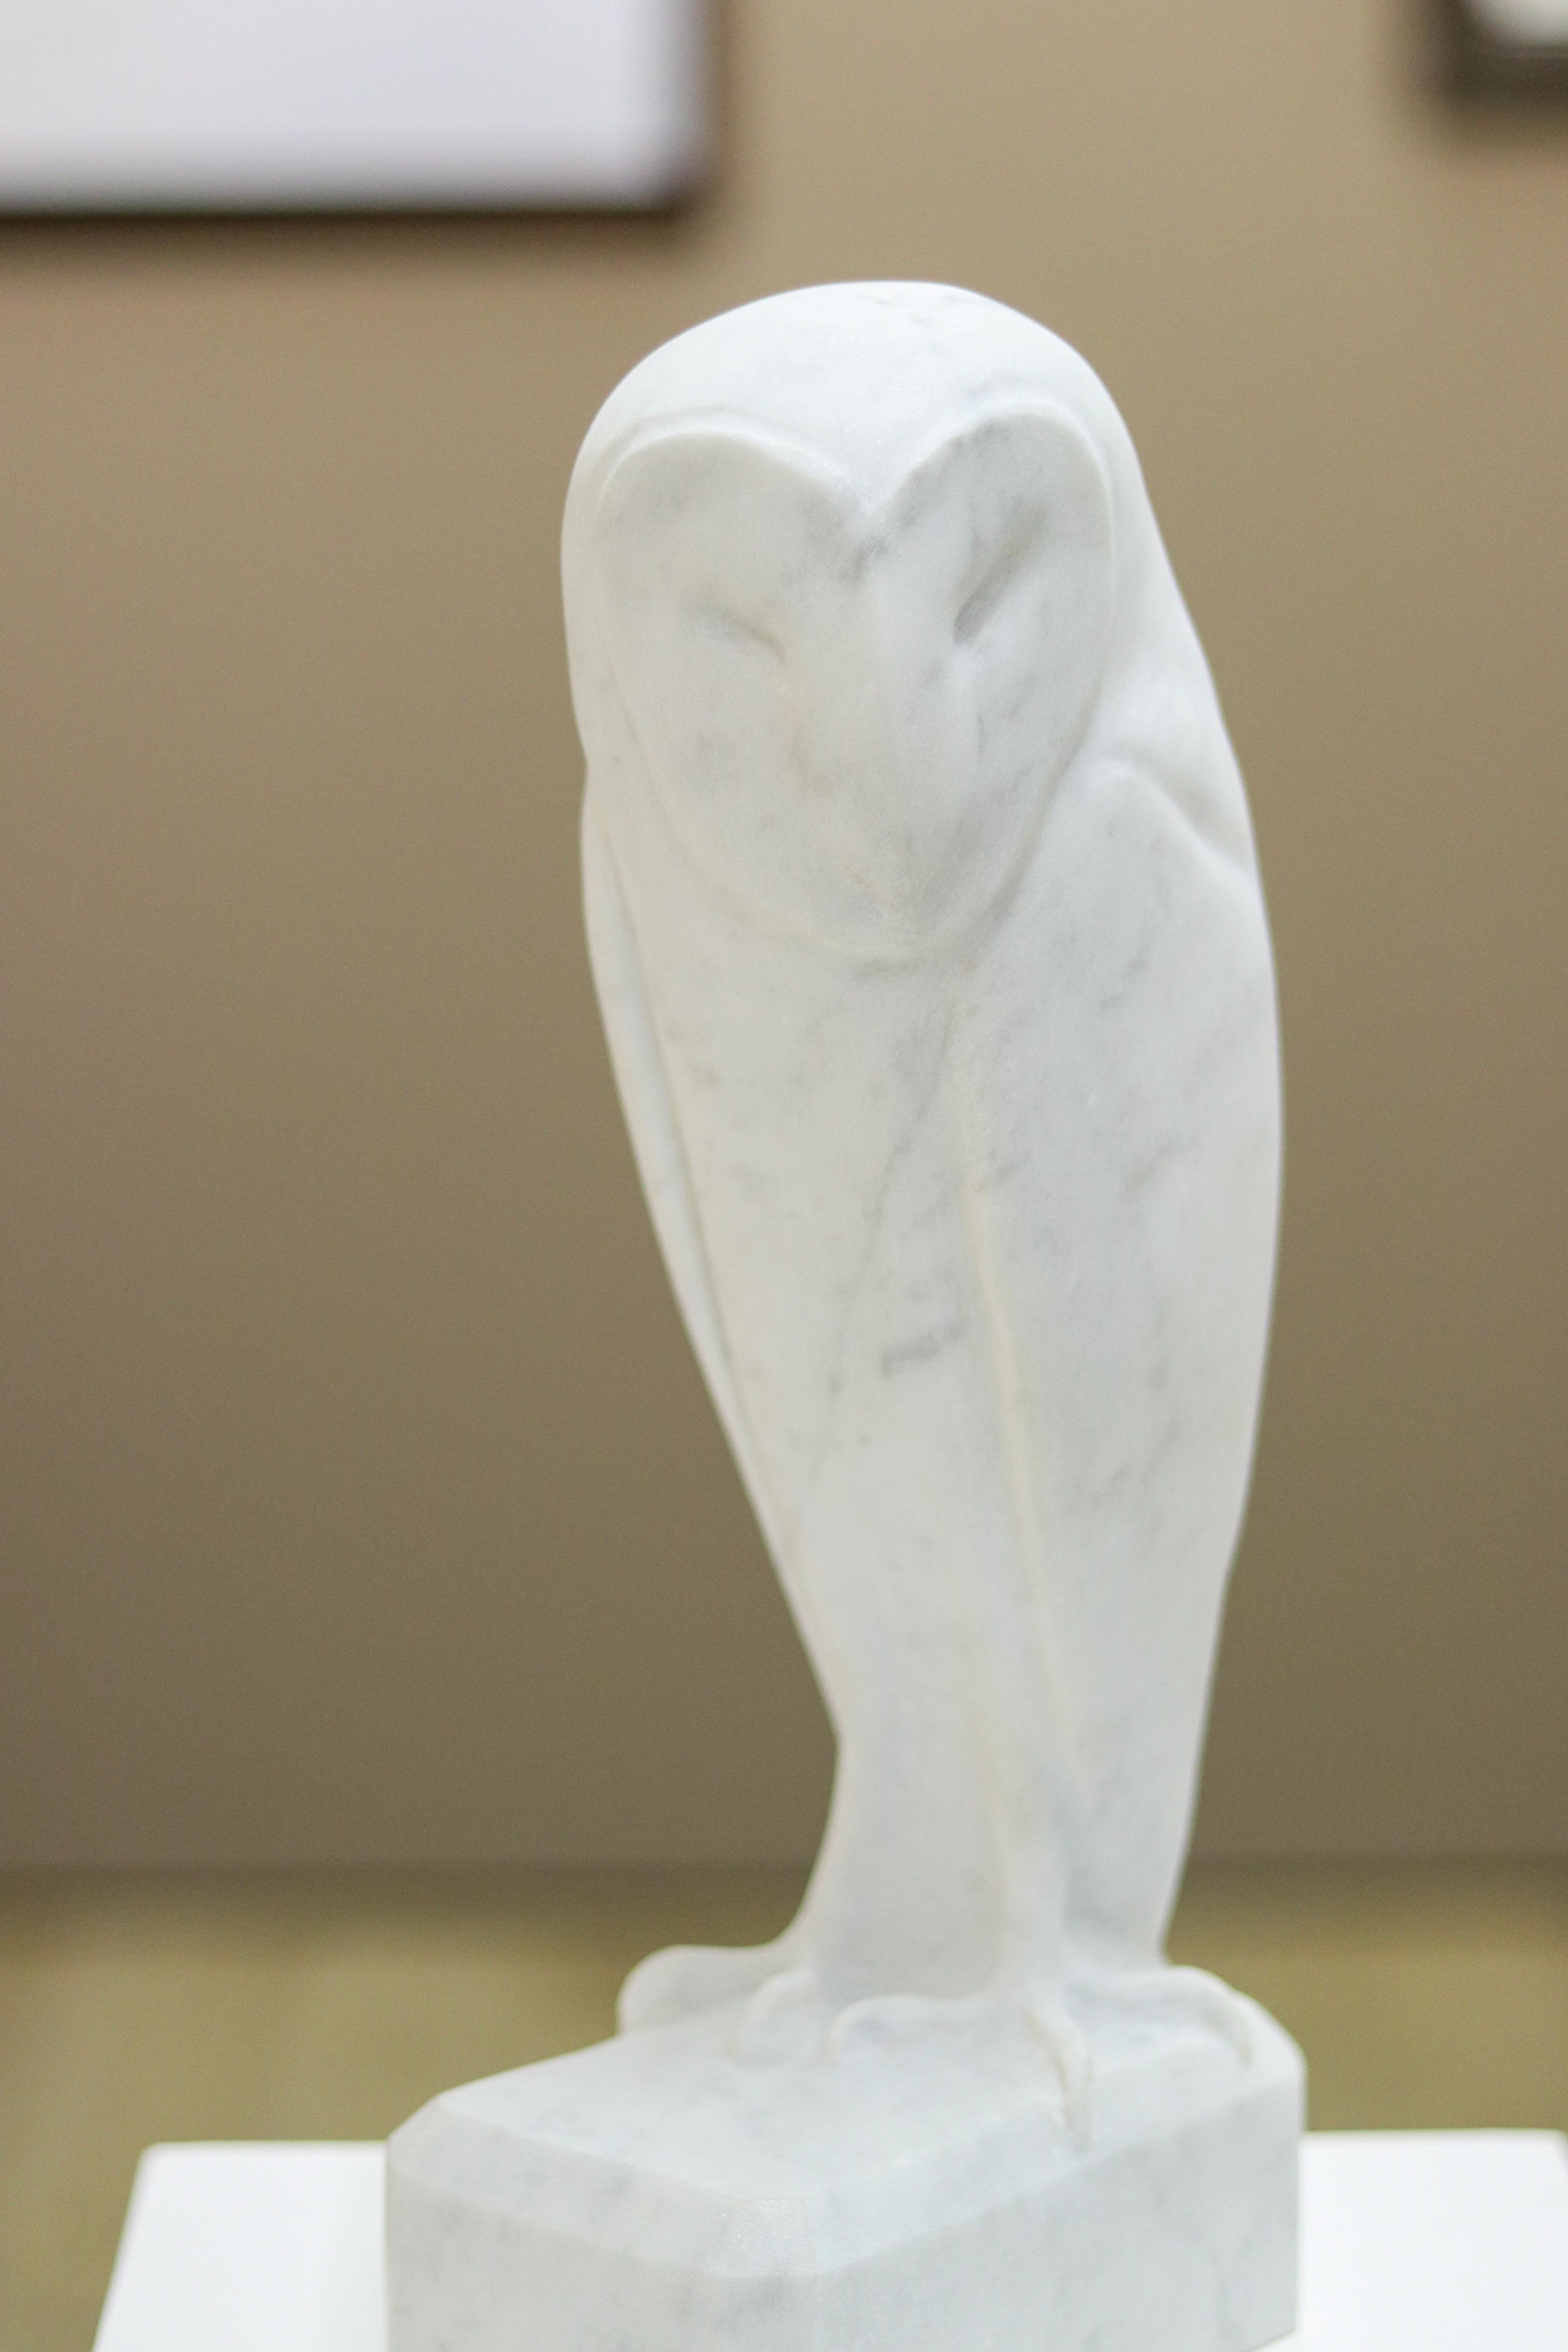 Barn Owl- 21st Century Dutch marble sculpture of an owl